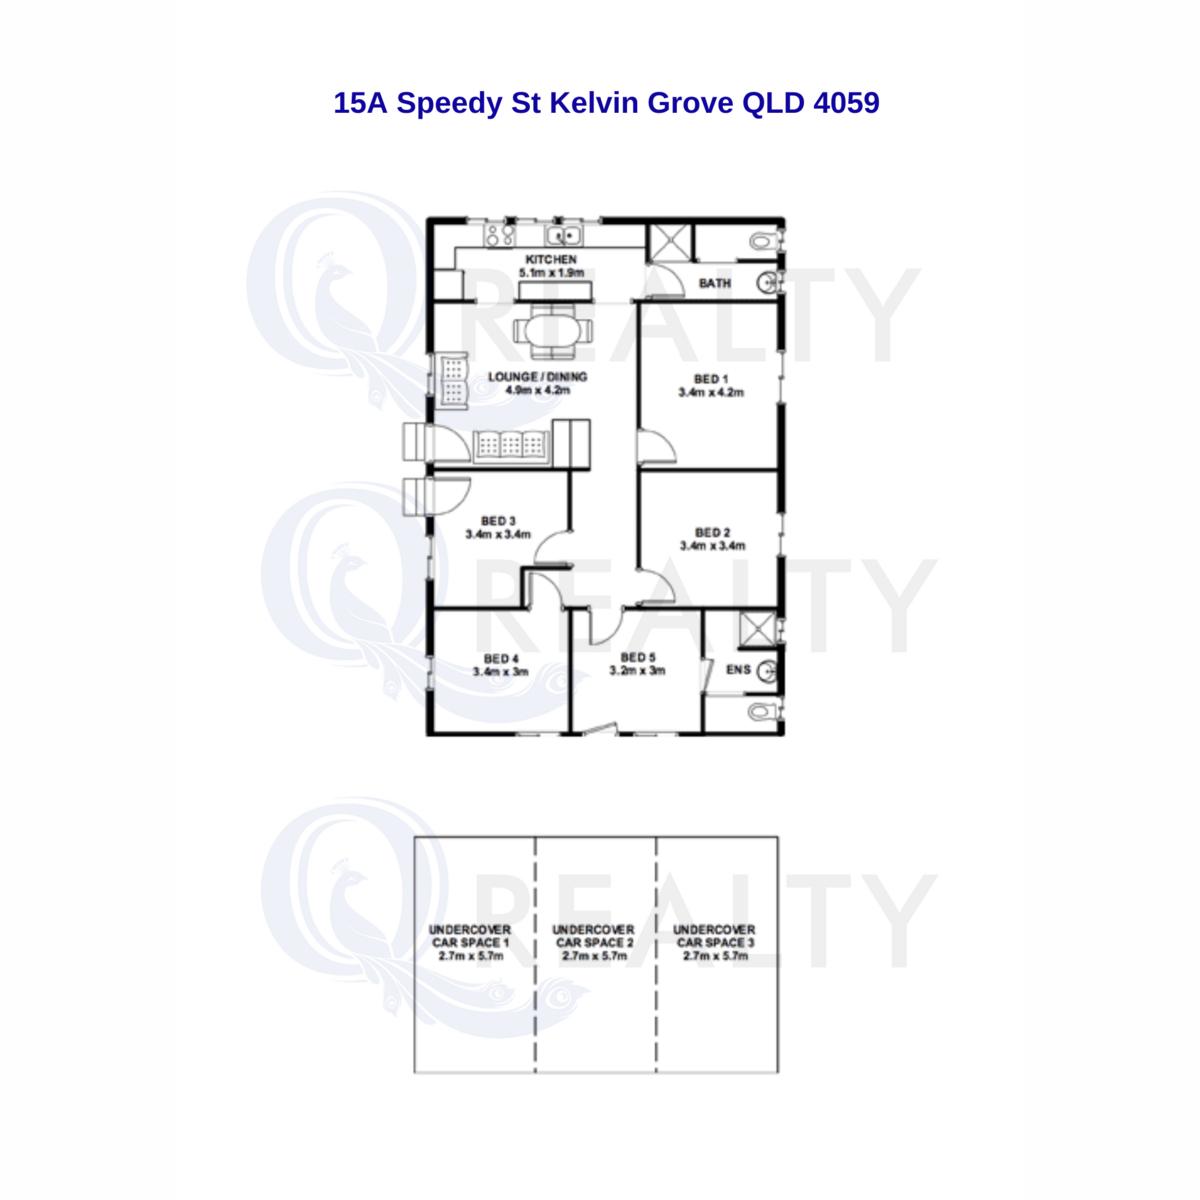 15A Speedy Street, Kelvin Grove  QLD  4059